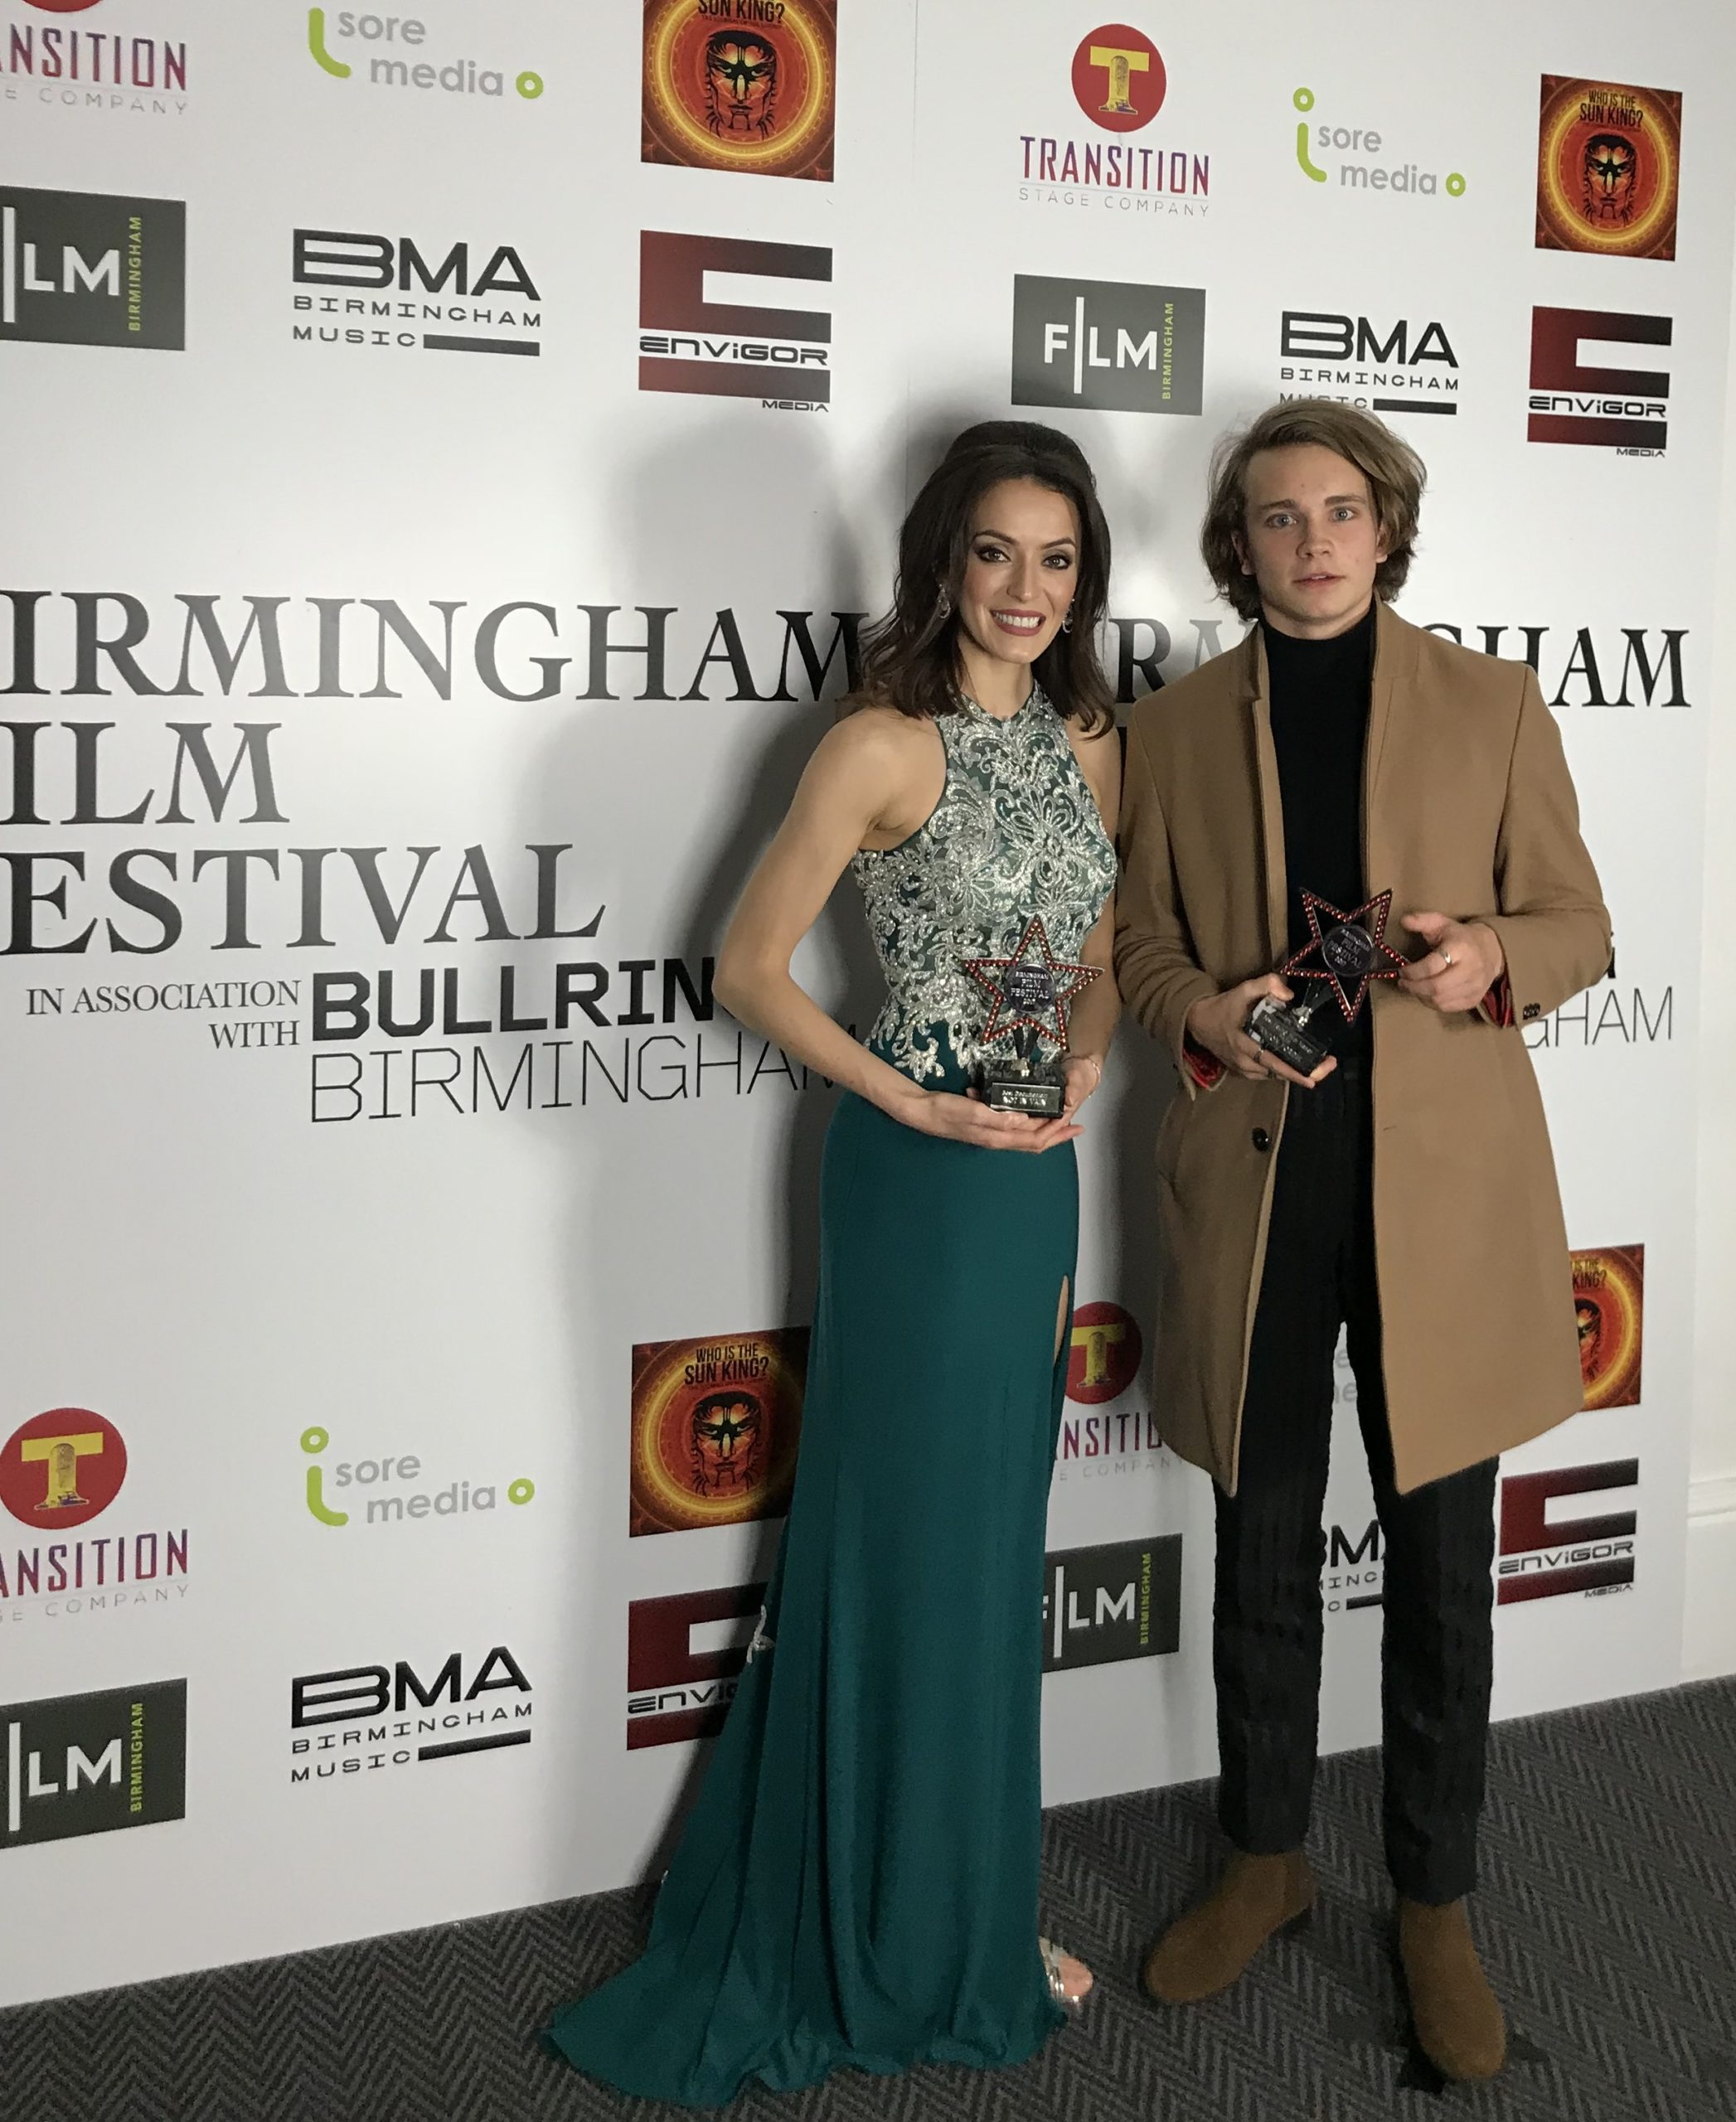 Birmingham Film Festival - Anton Forsdik Anton Forsdik Young film maker BIRMINGHAM FILM FEST